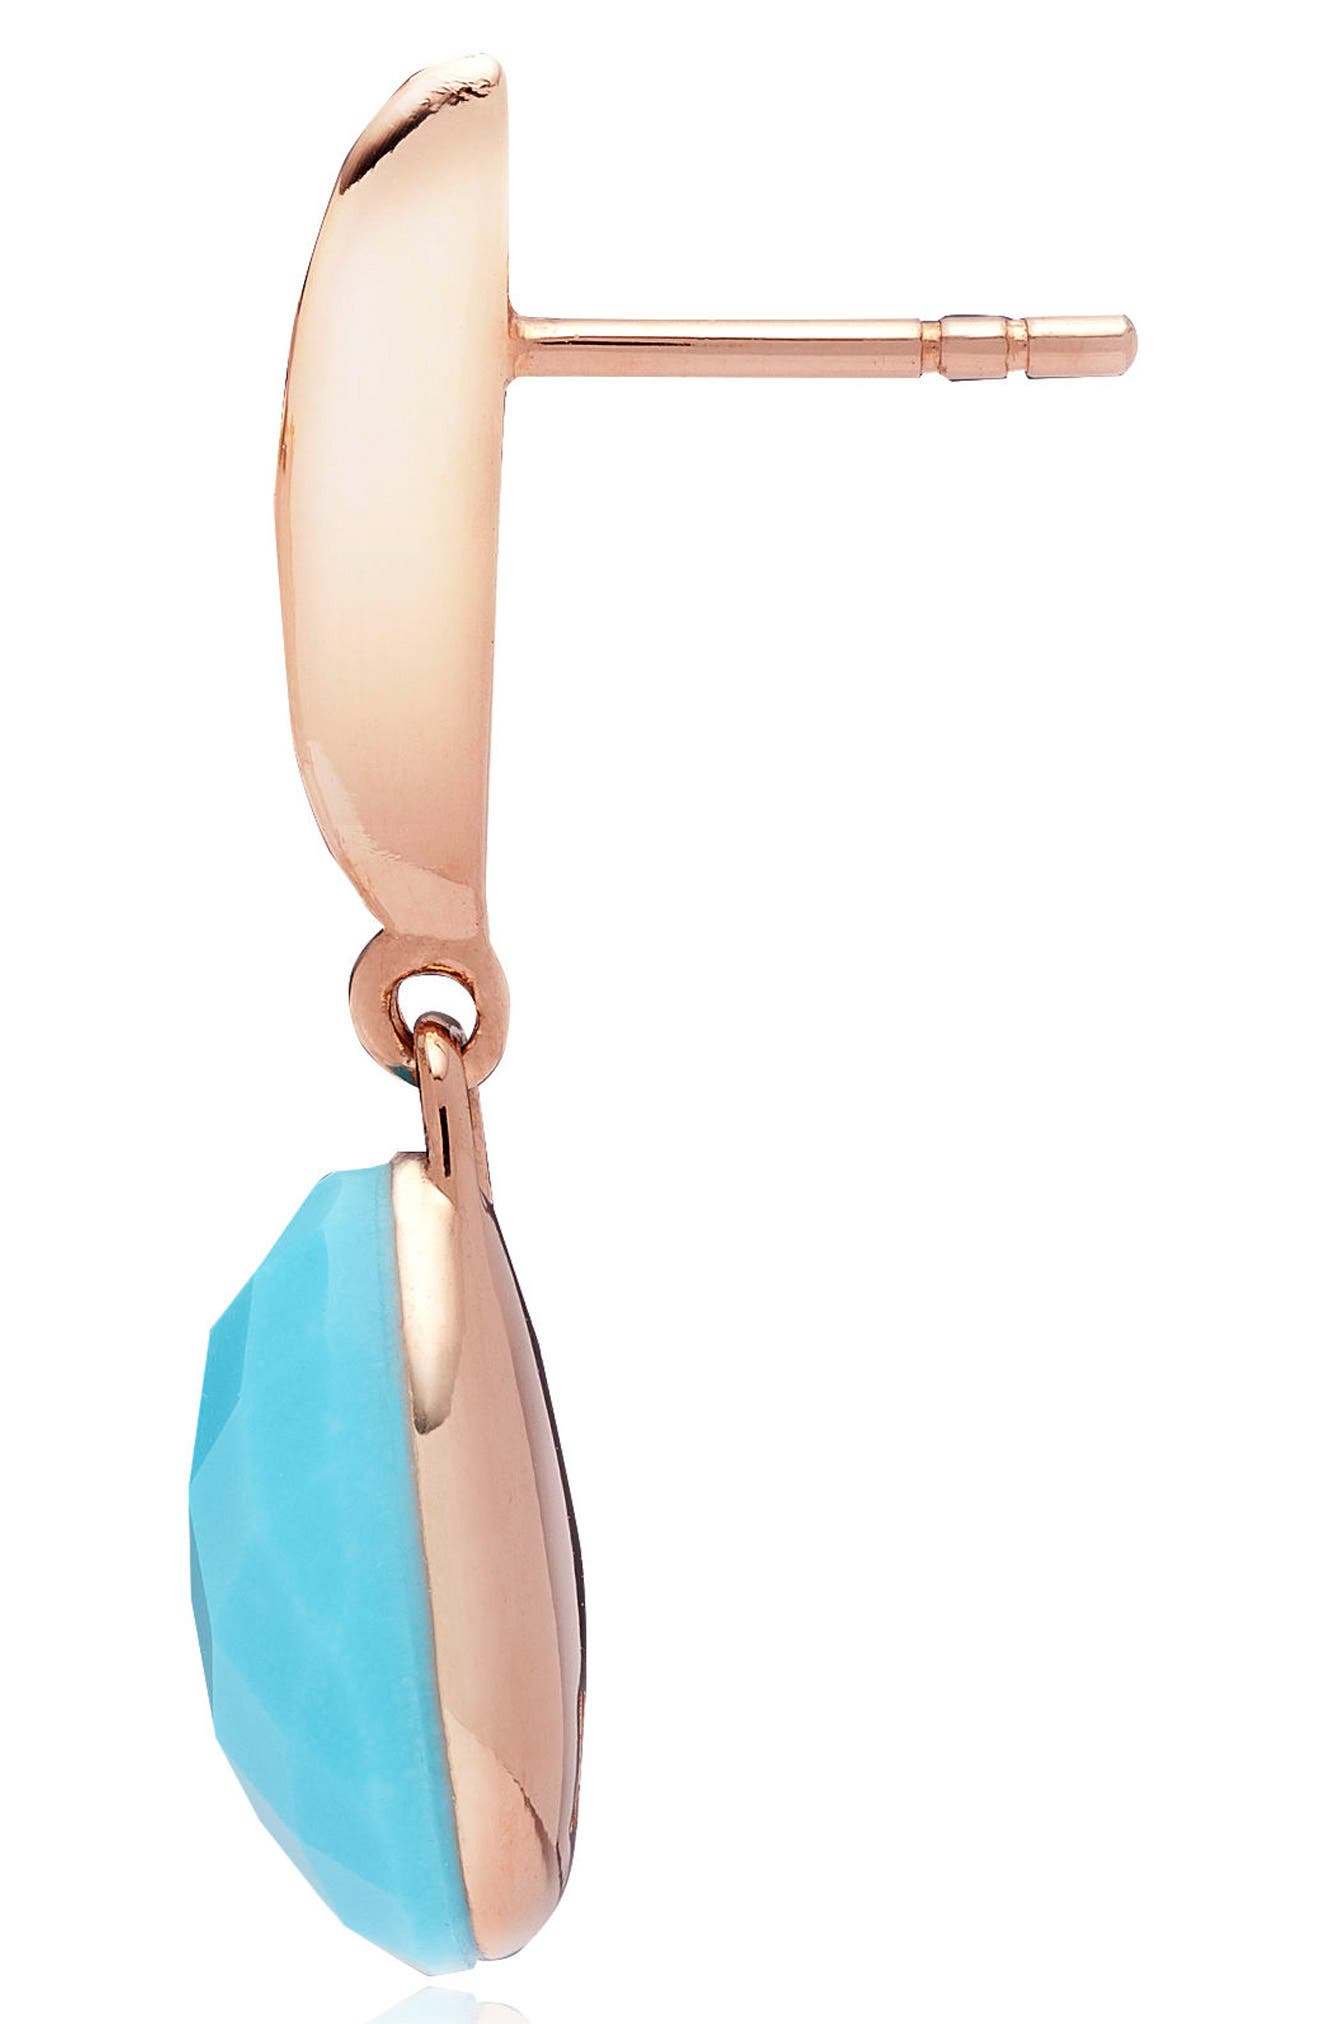 Nura Small Teardrop Earrings,                             Alternate thumbnail 4, color,                             TURQUOISE